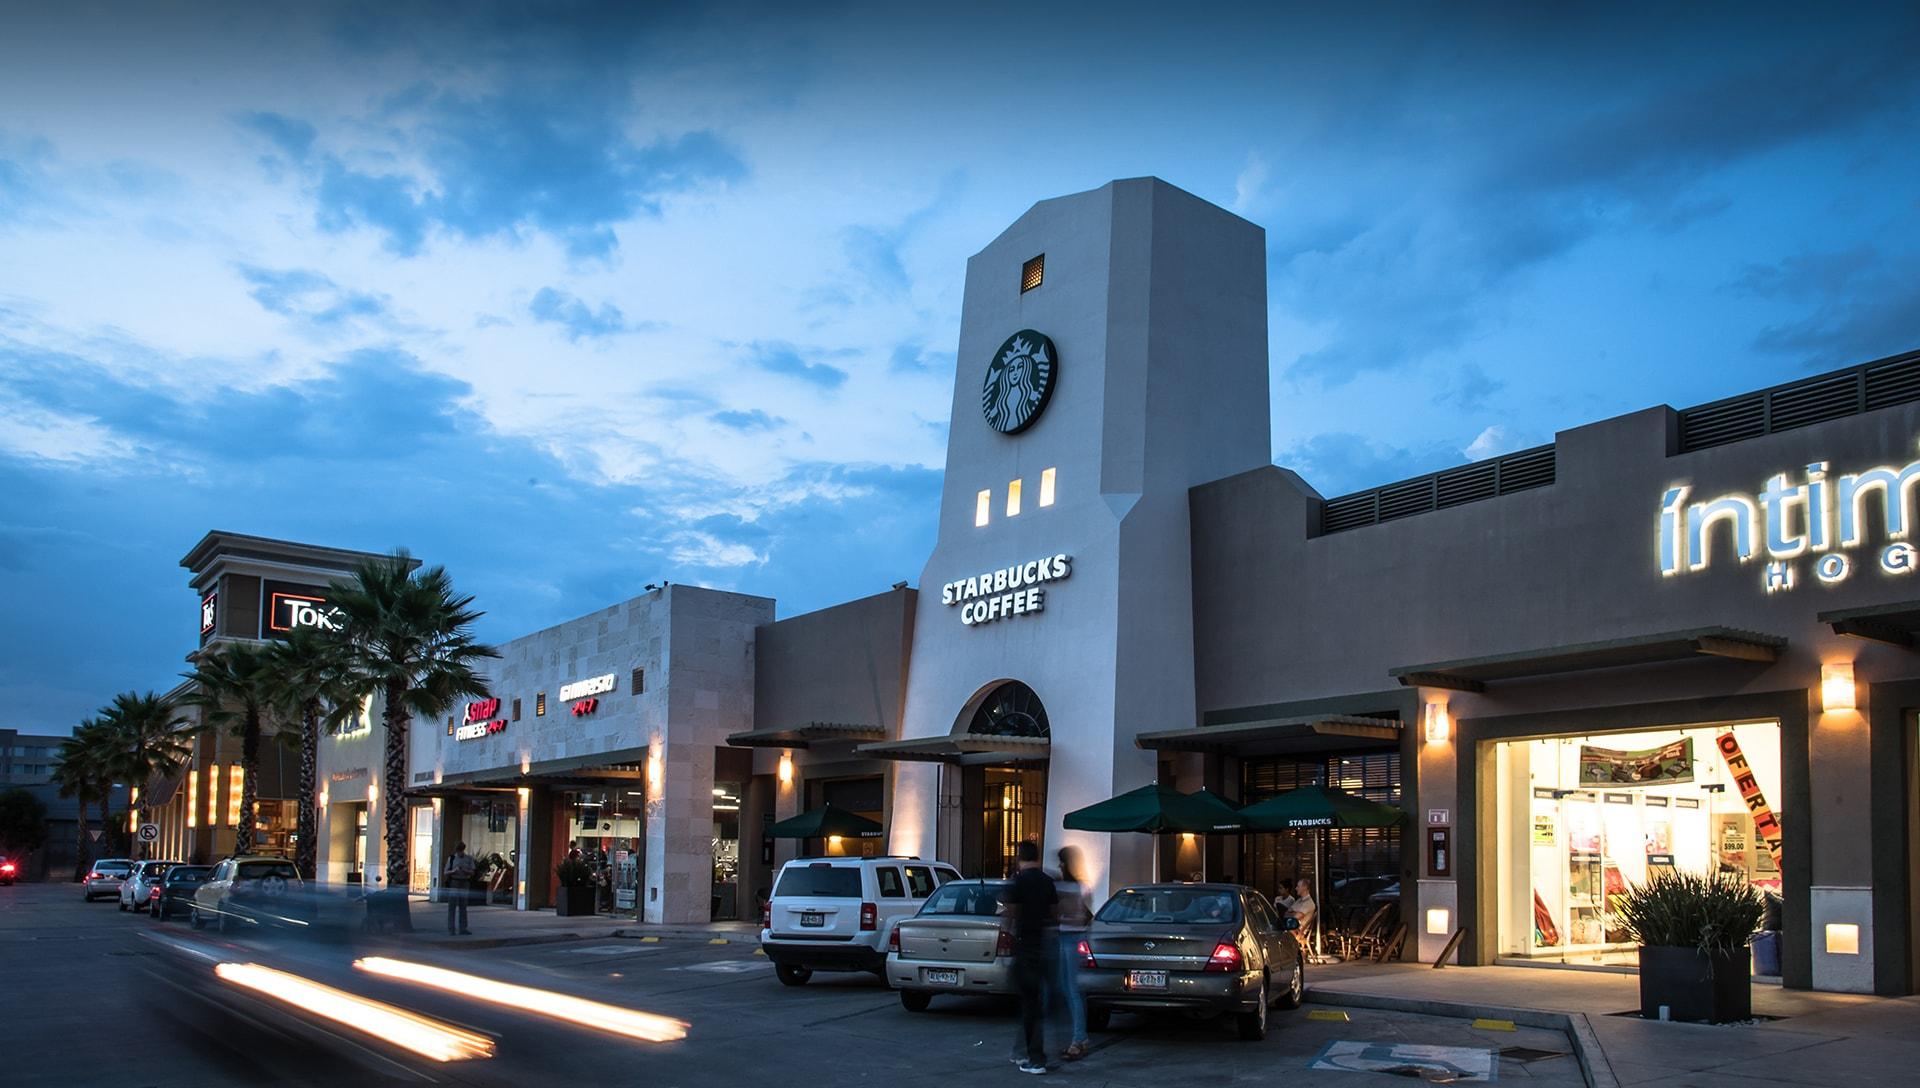 Plaza Palmas Aguascalientes proyecto diseñado por grupo link desarrollo inmobiliario